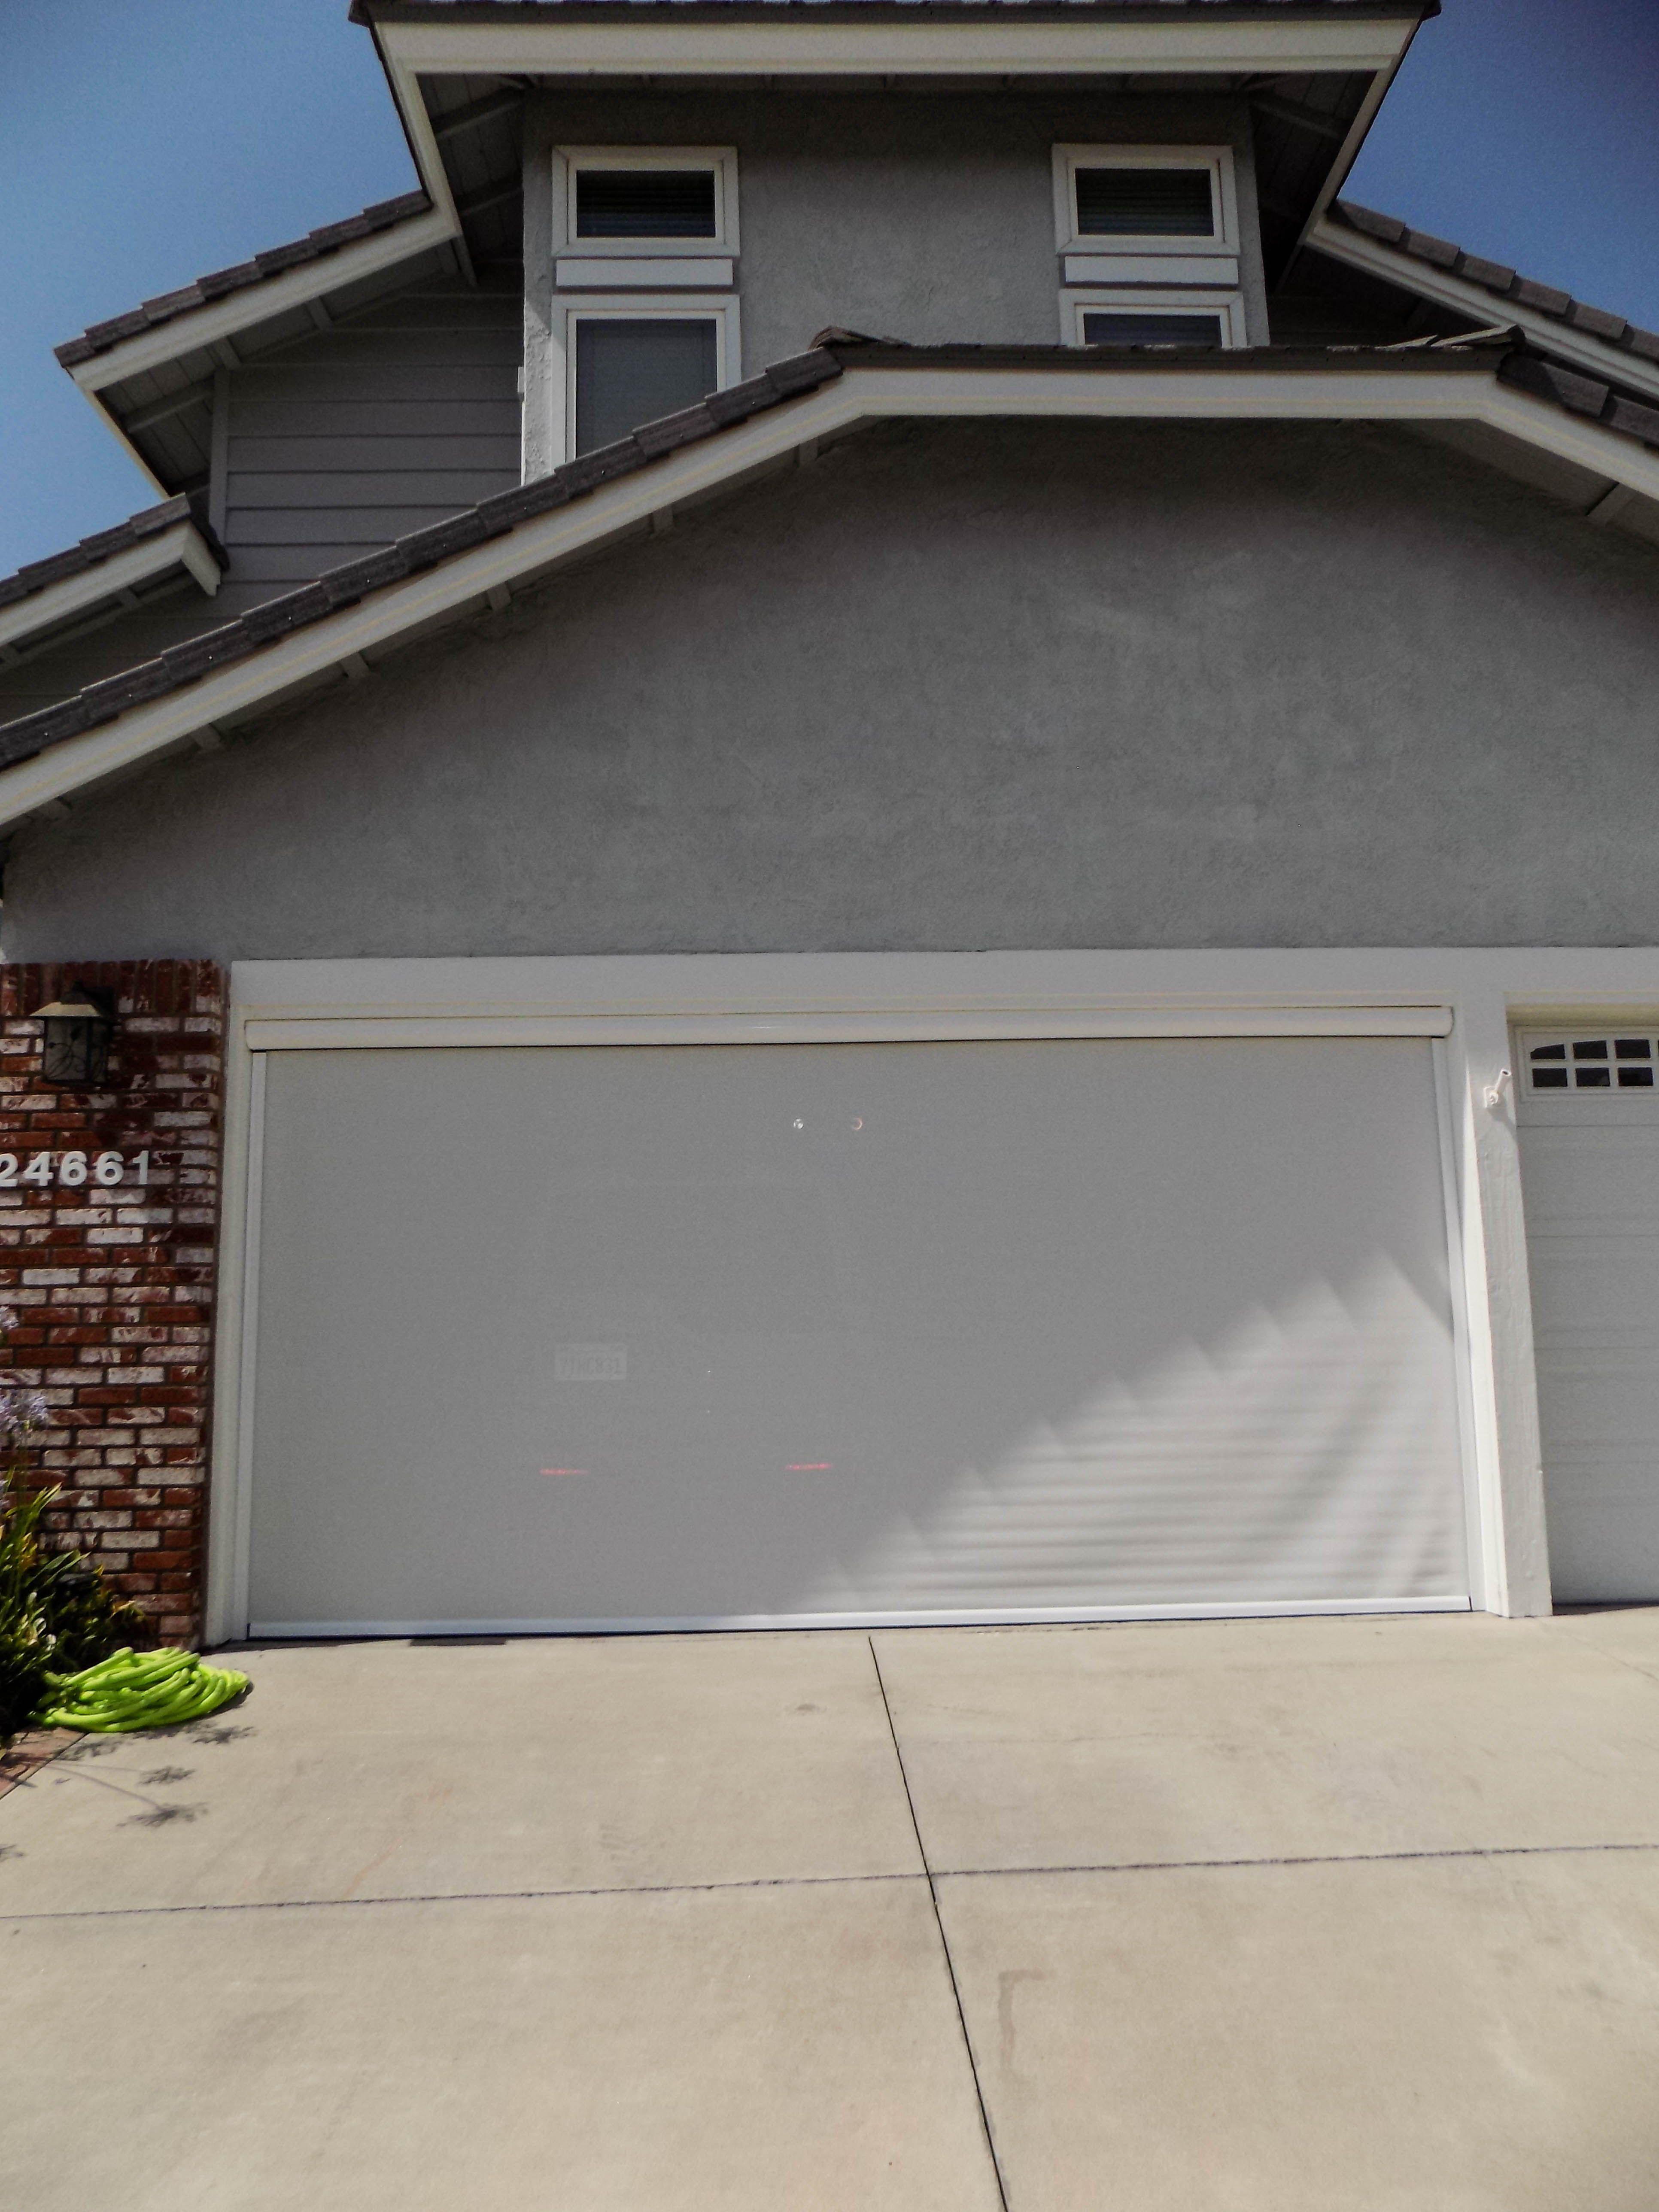 We Installed A Motorized Power Screen On A Garage Door In Laguna Hills California In Orange County F Garage Doors Garage Door Design Garage Door Installation